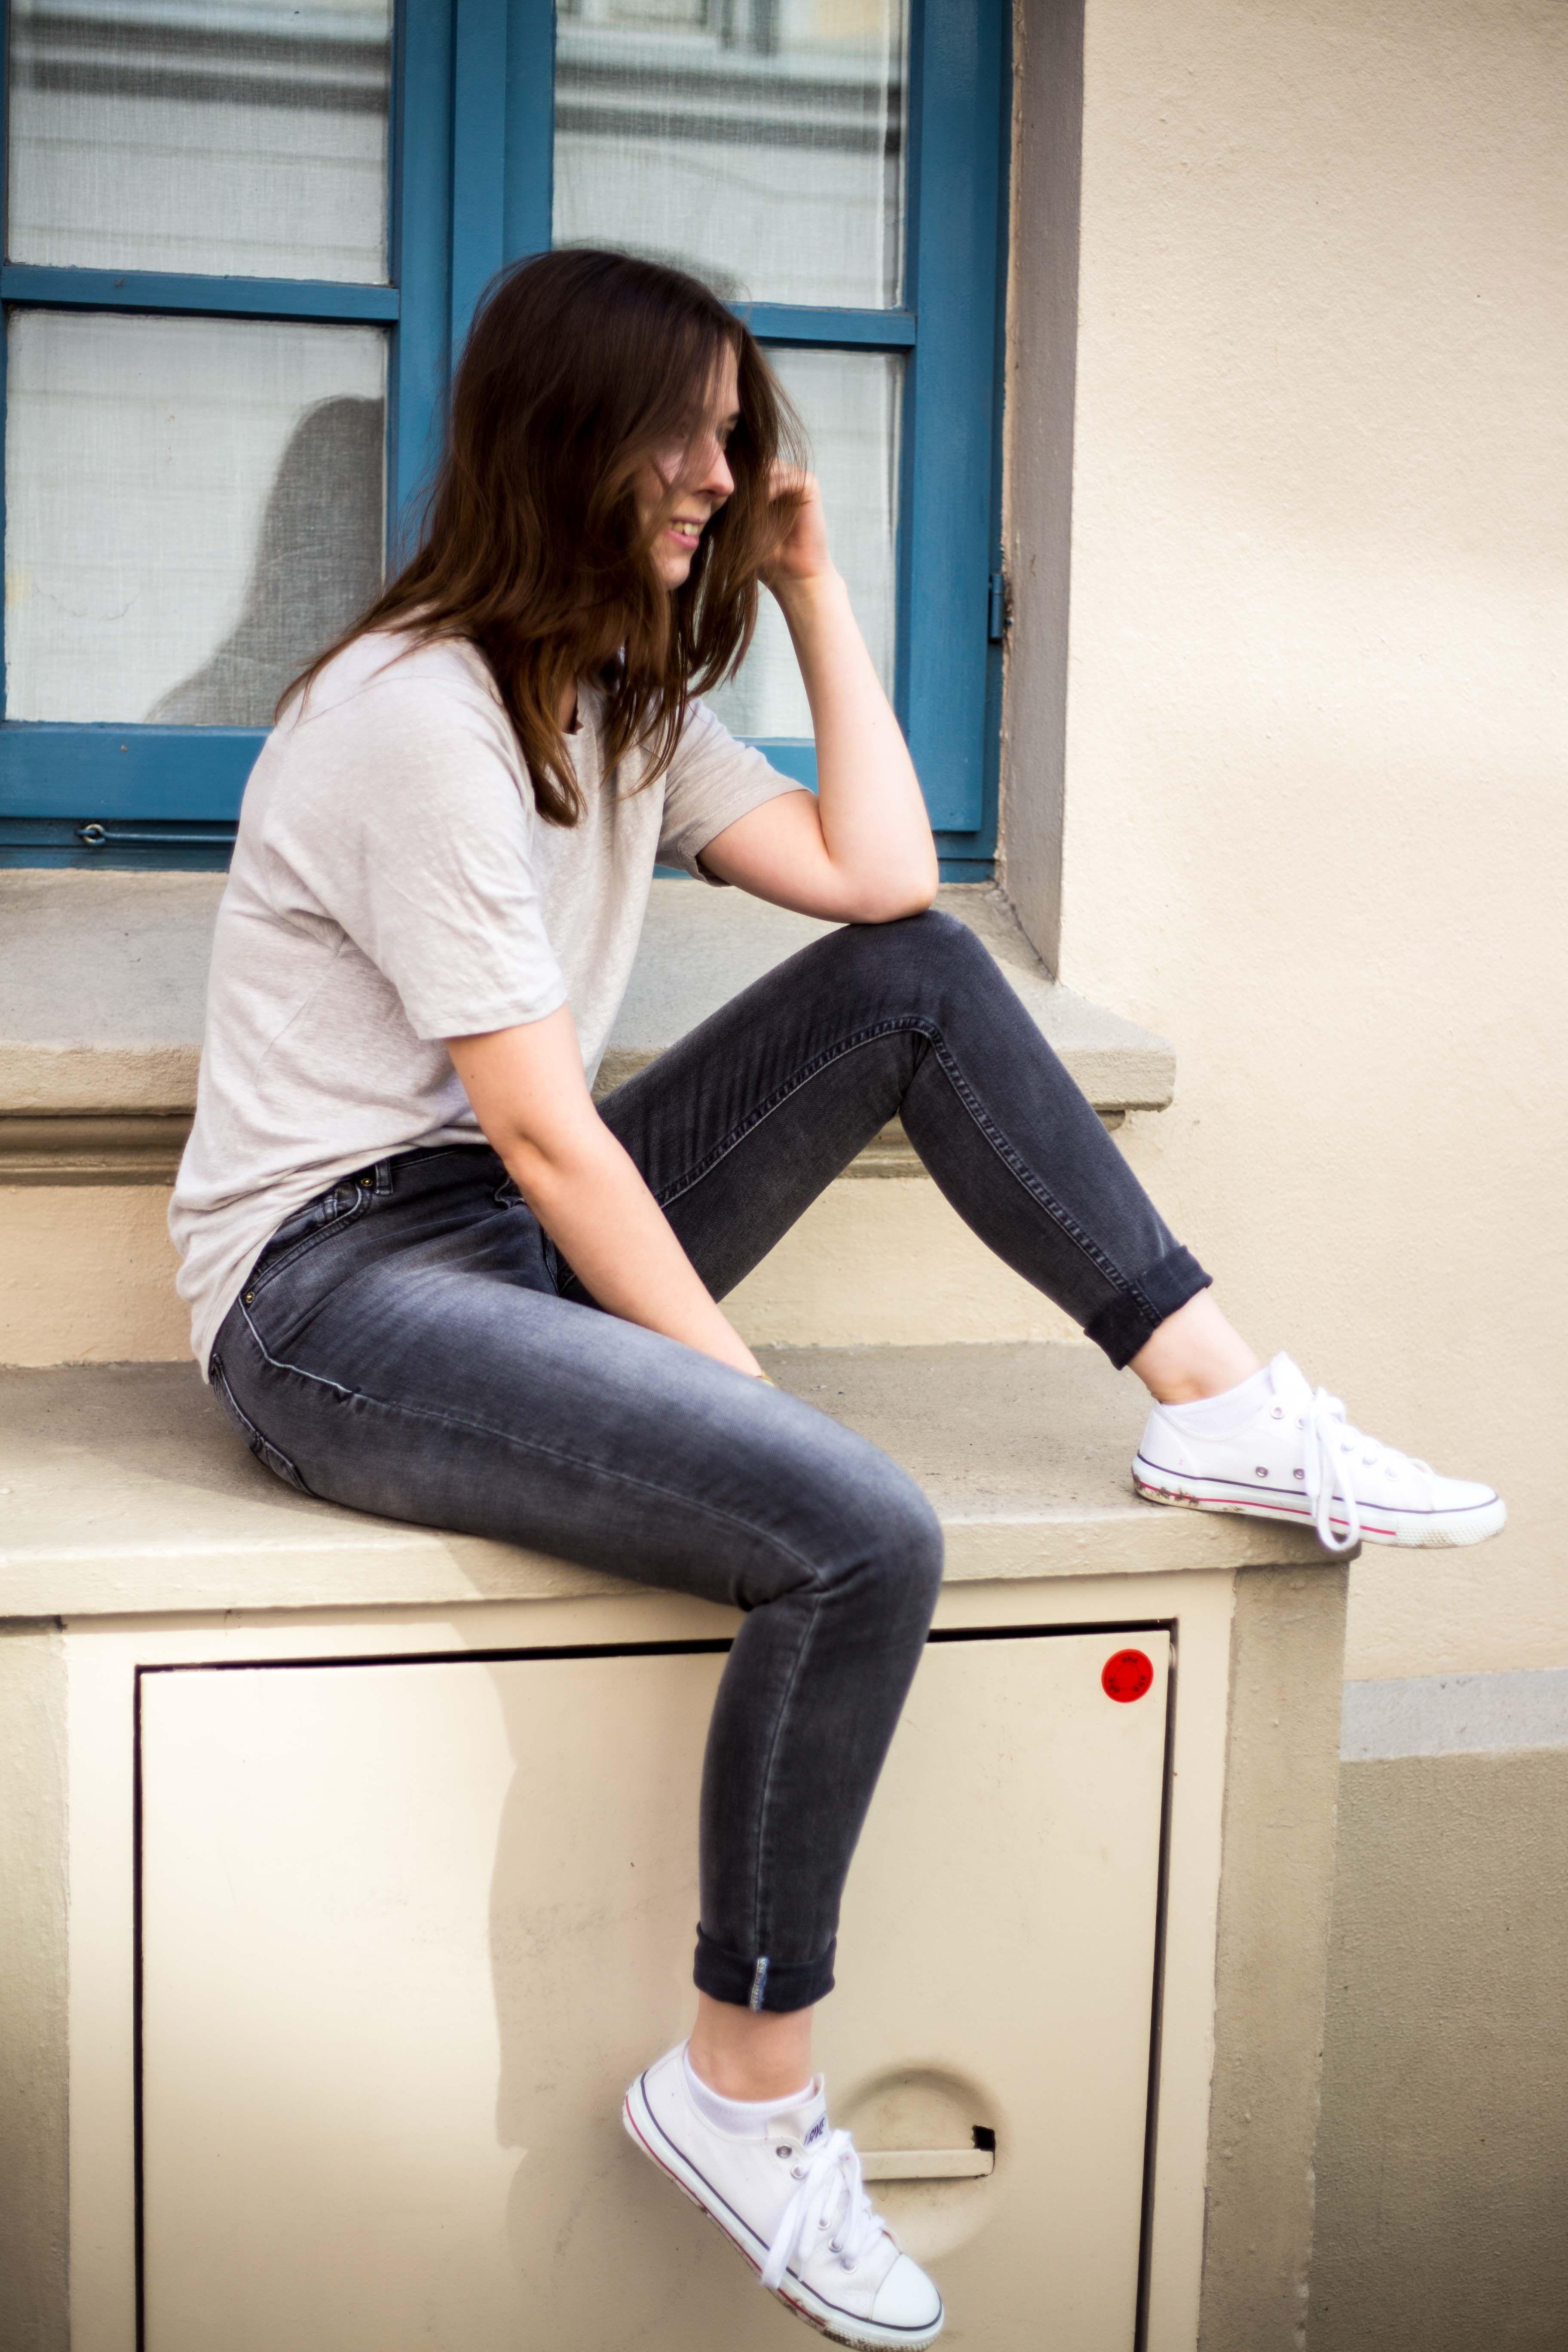 Keeping It Simple – Leinen T Shirt mit Jeans